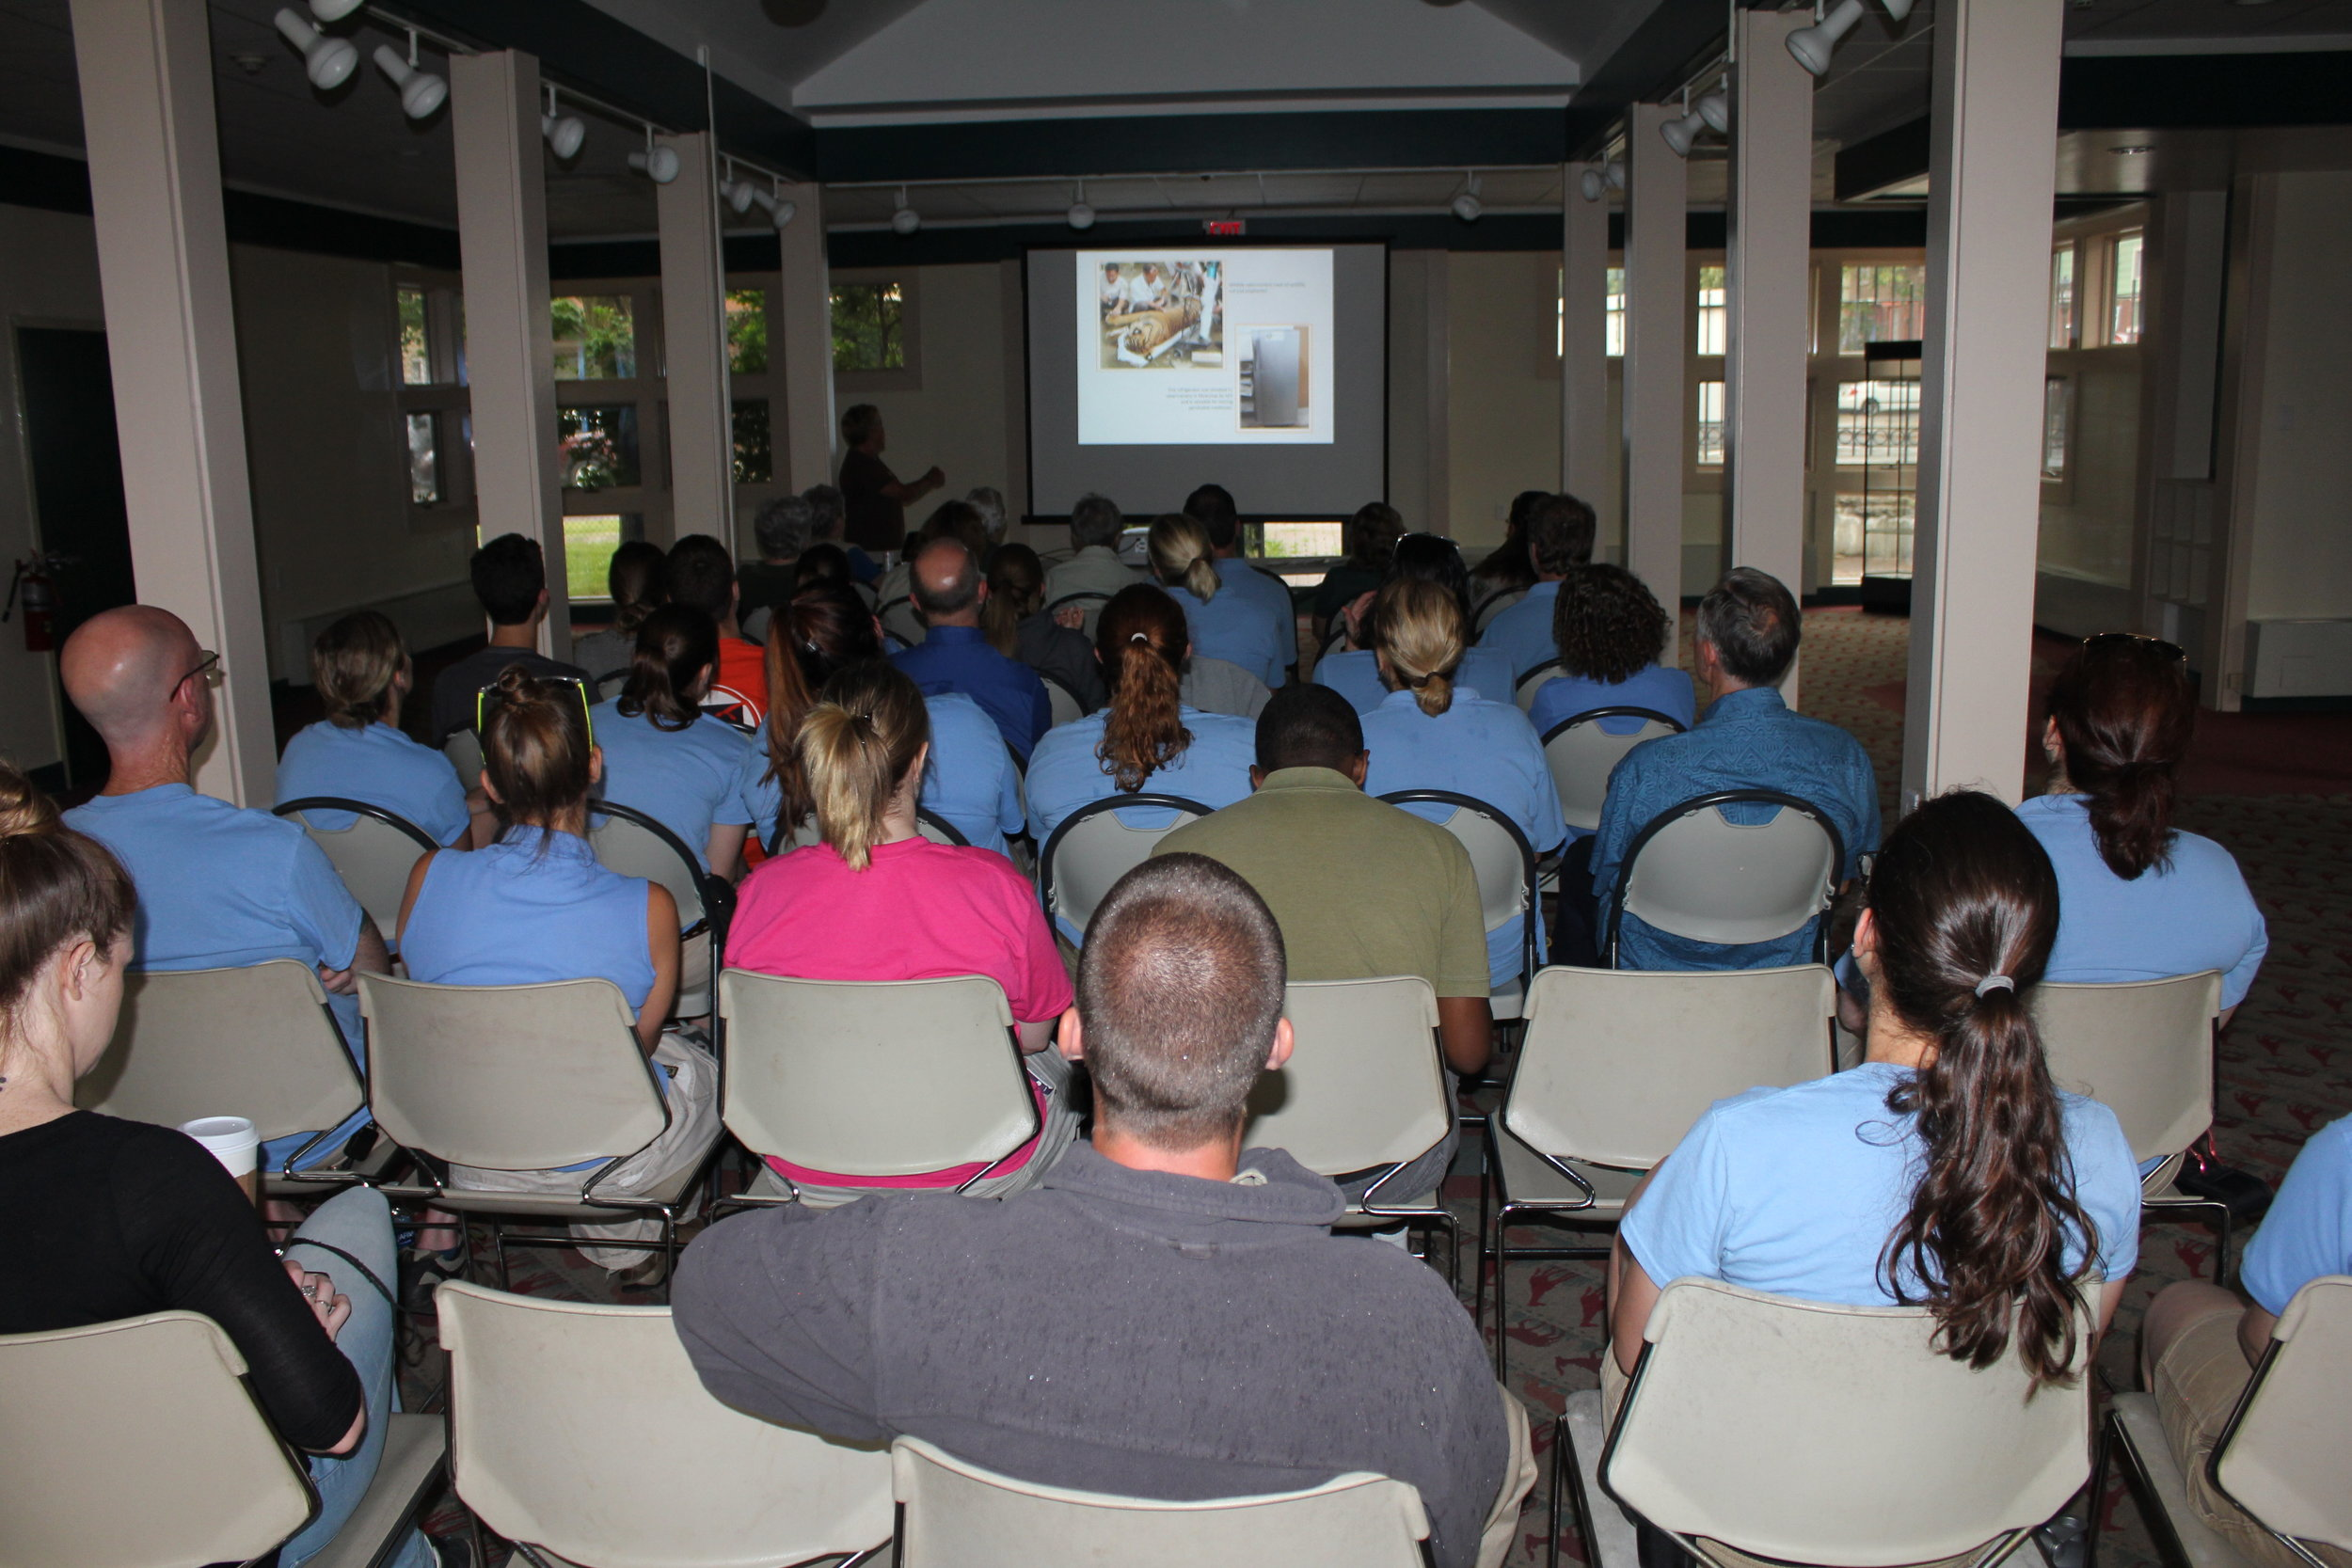 Buffalo Zoo staff & volunteers